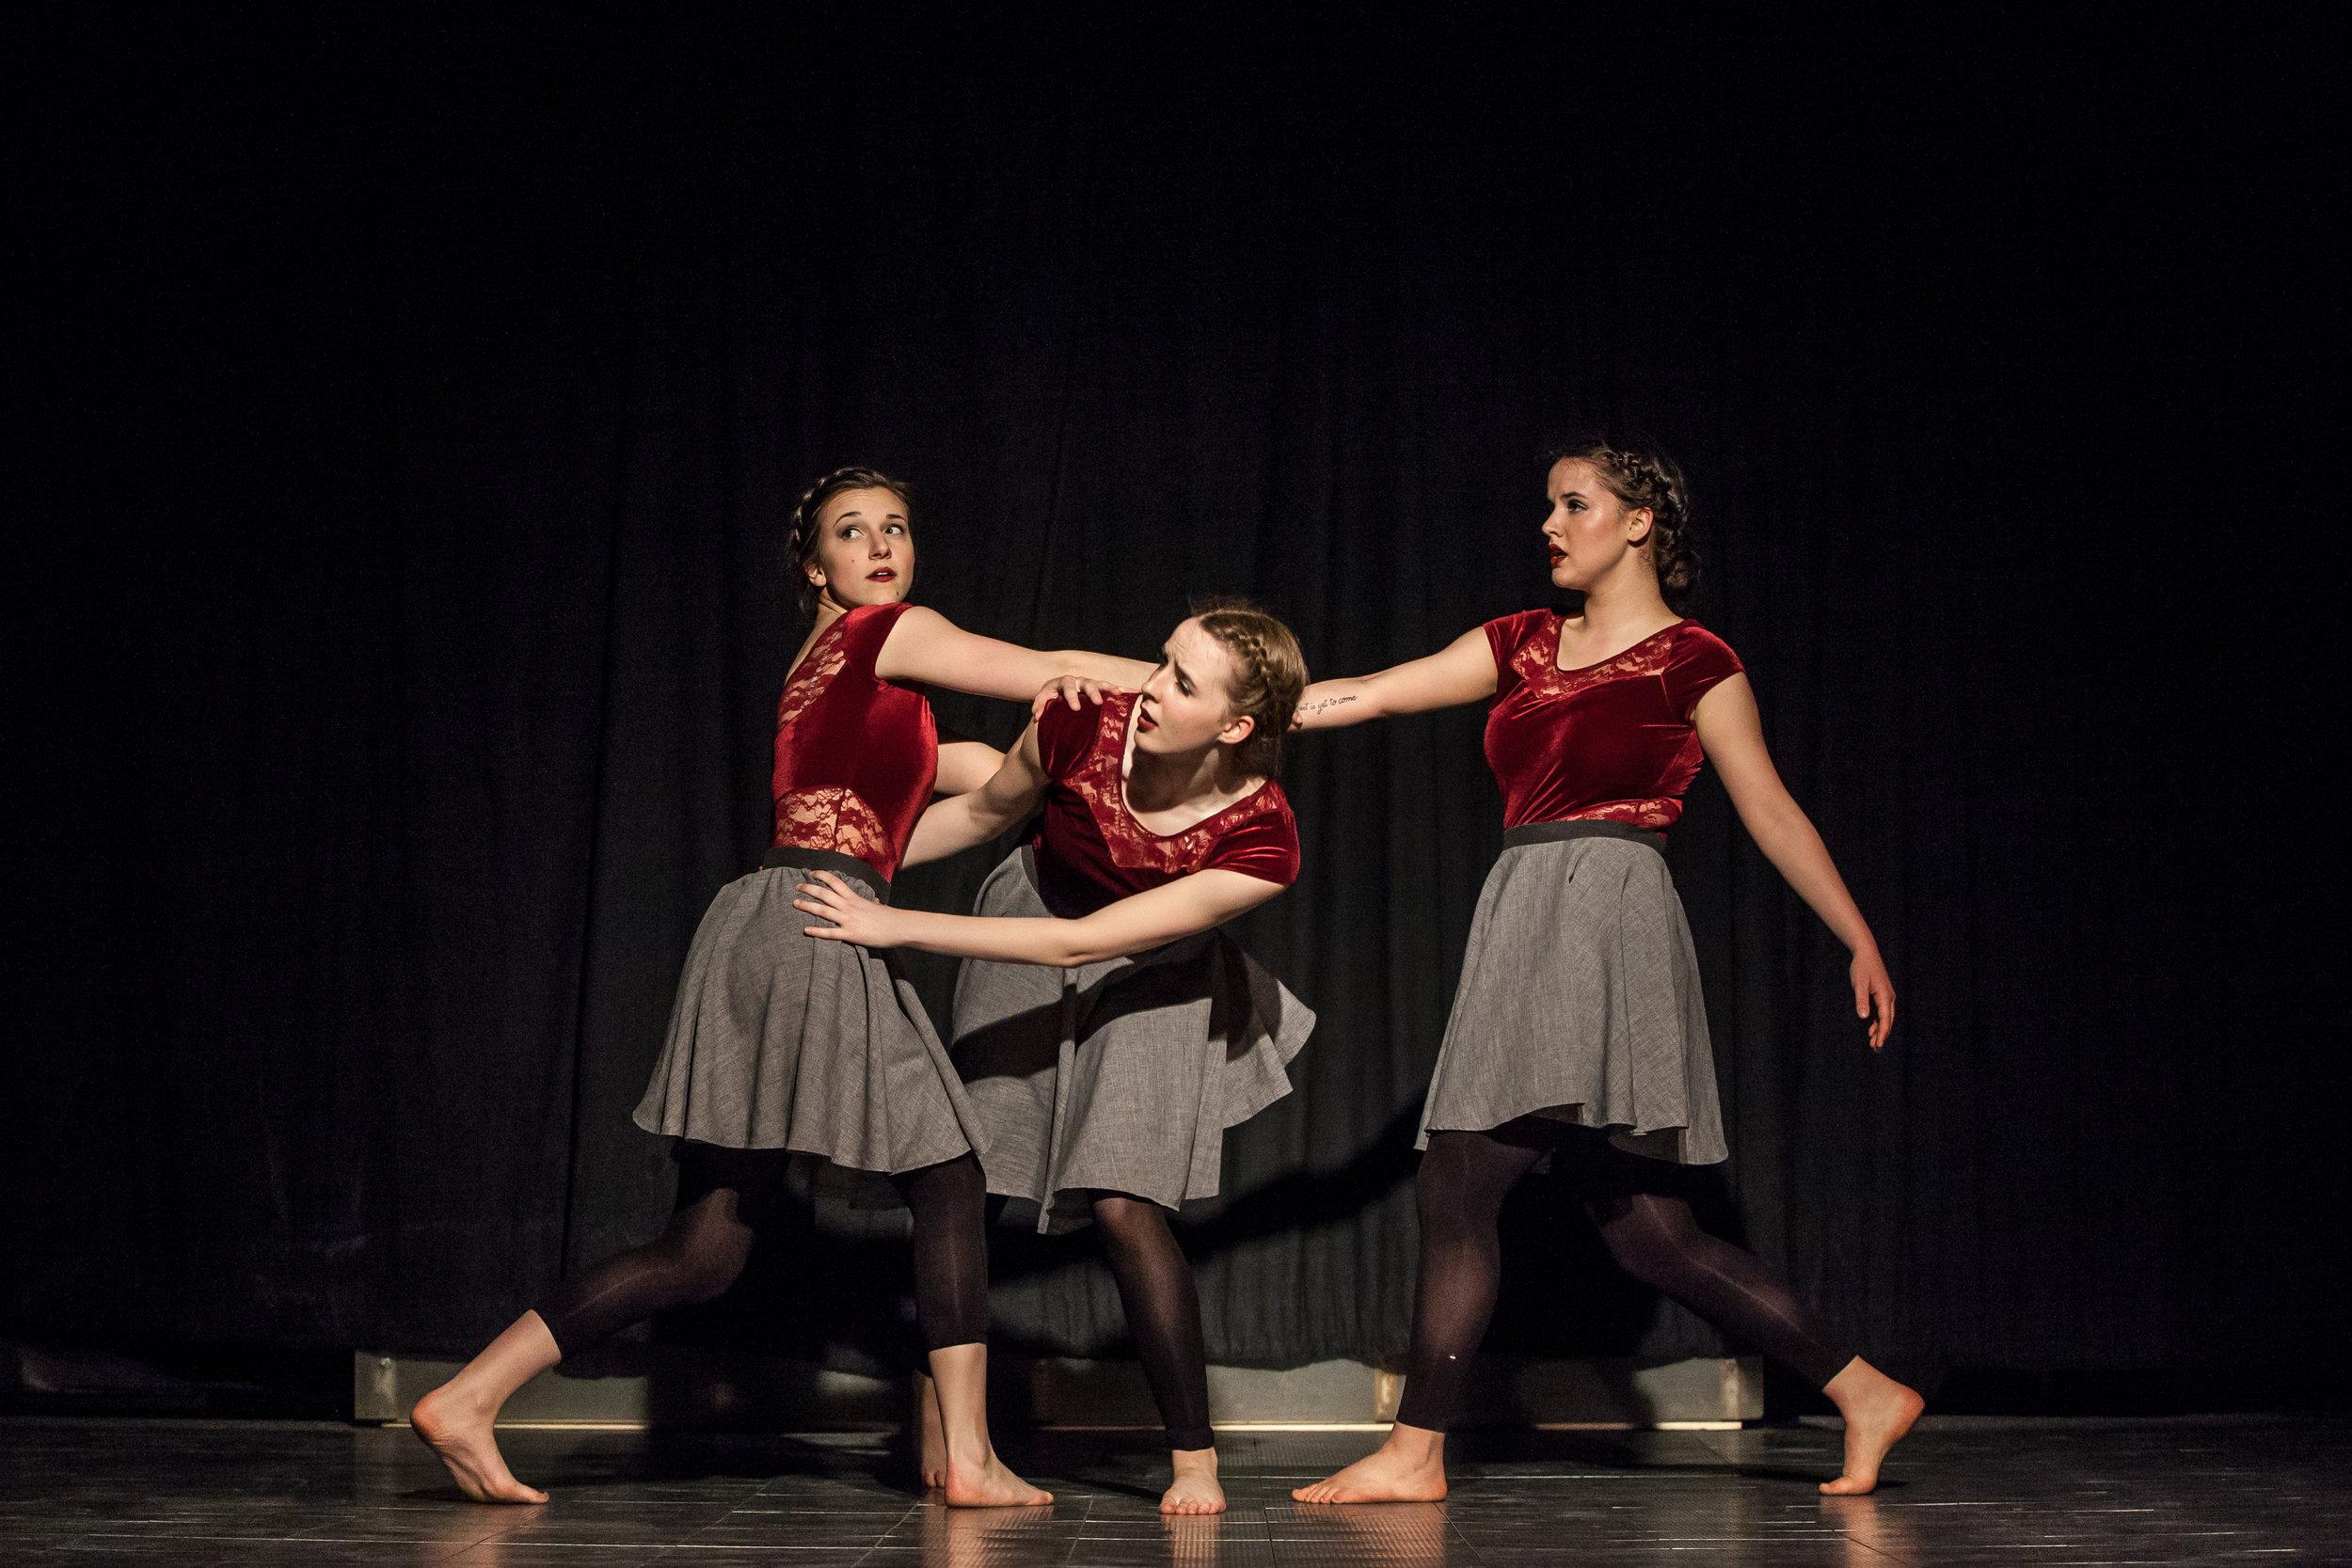 Manitoba College of Dance